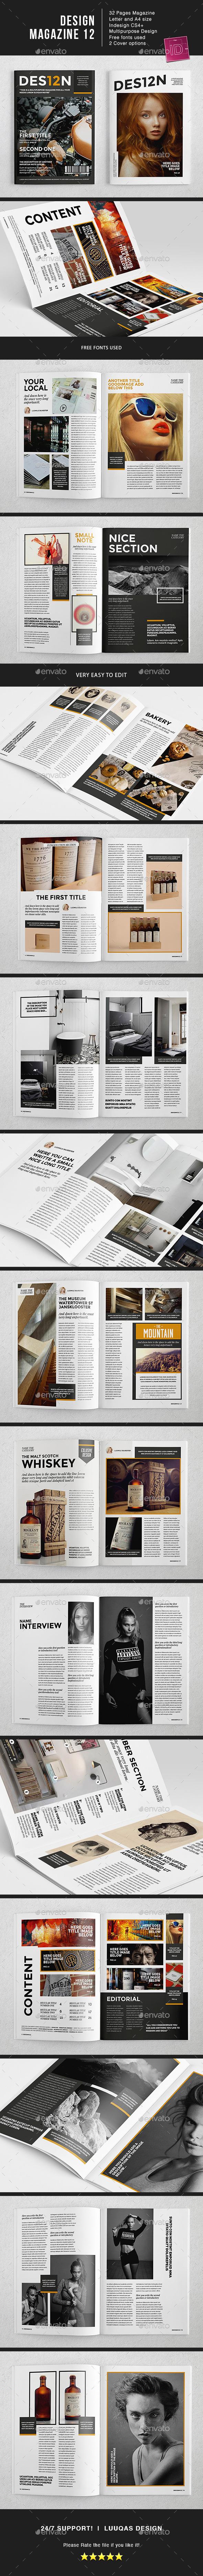 Design Magazine 12 Template - Magazines Print Templates